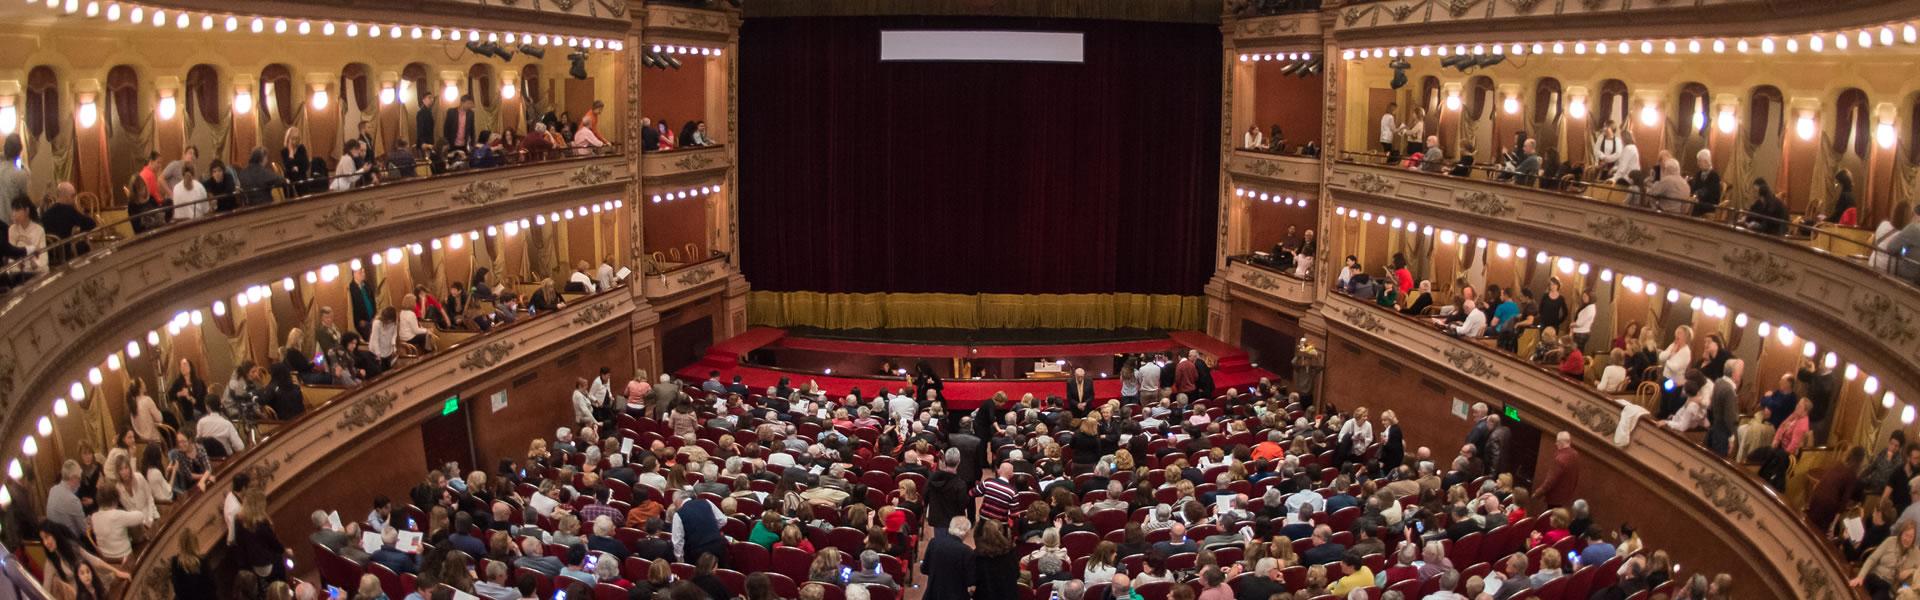 teatro-avenida